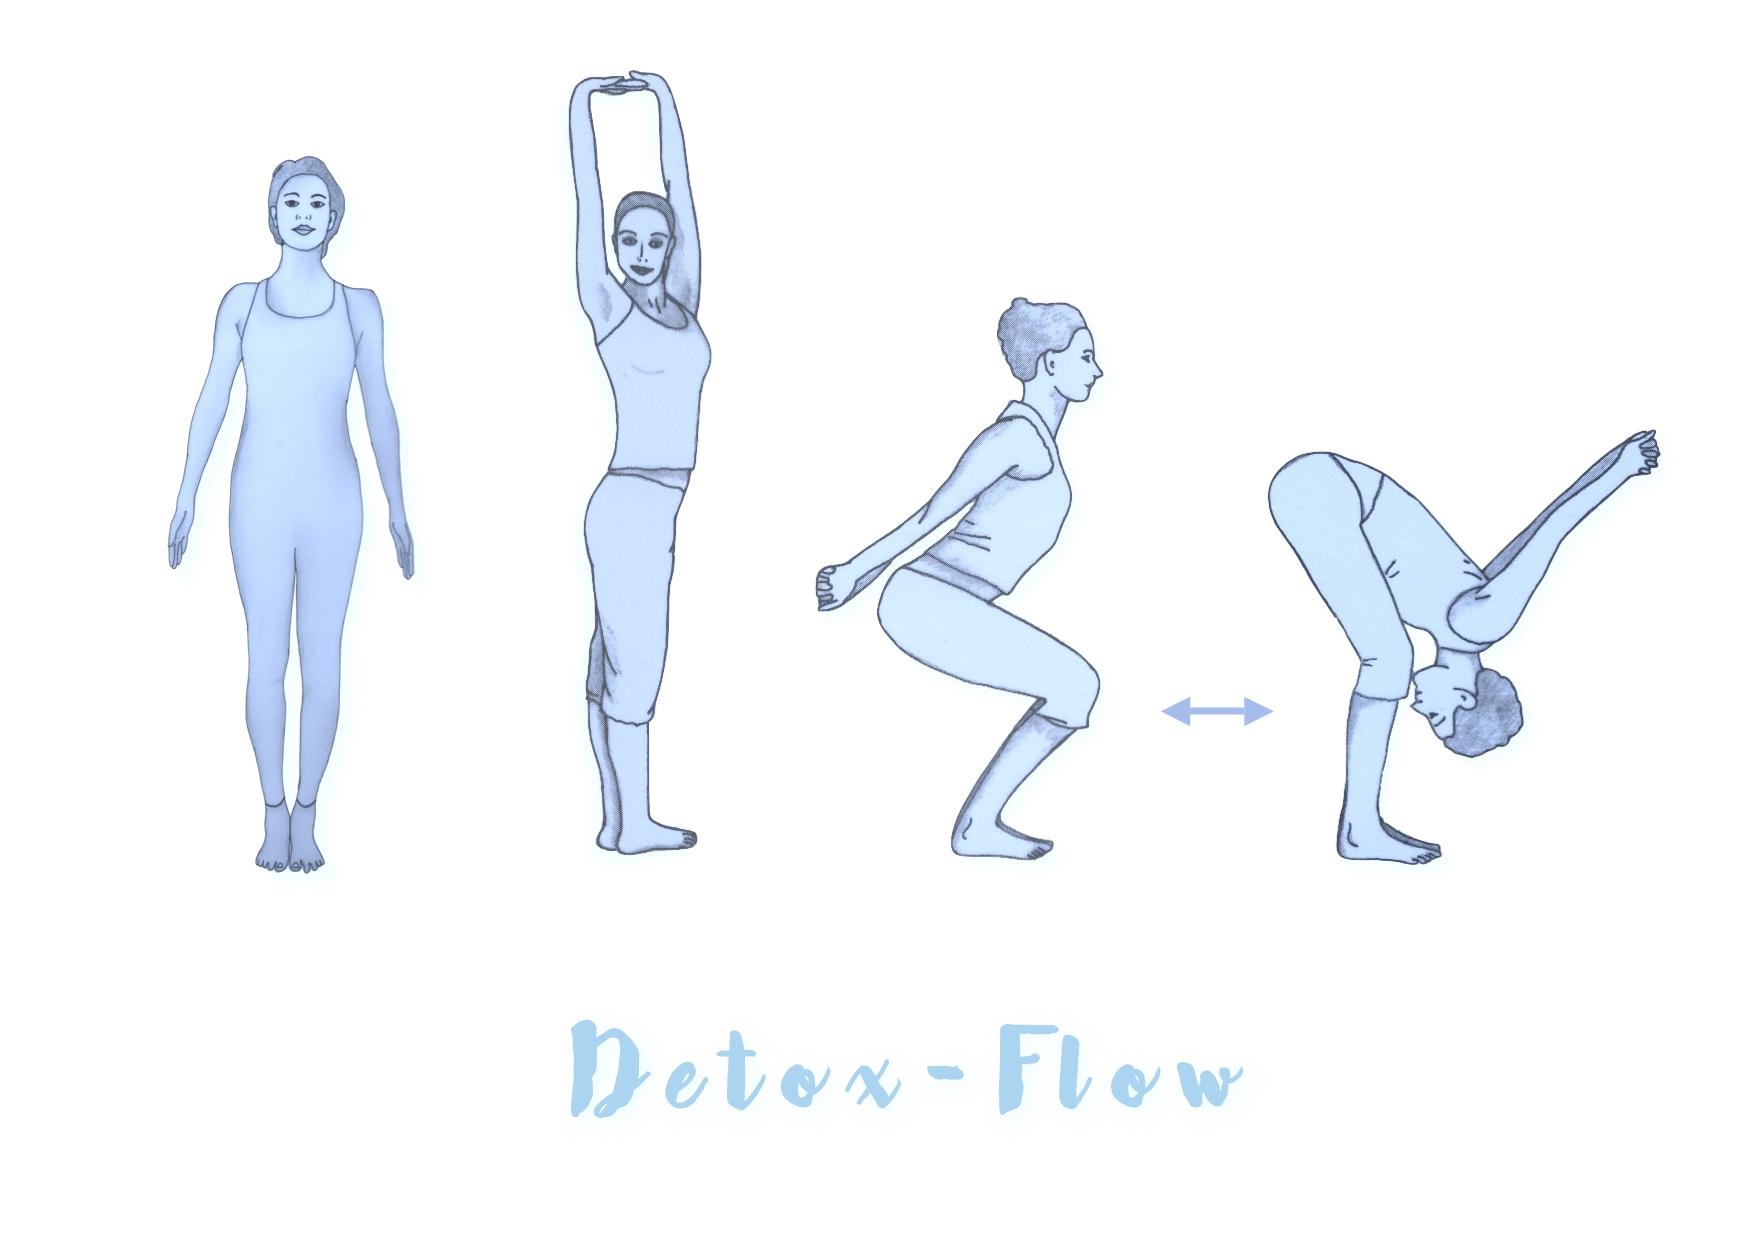 dieyogapraxis :: Detox-Flow